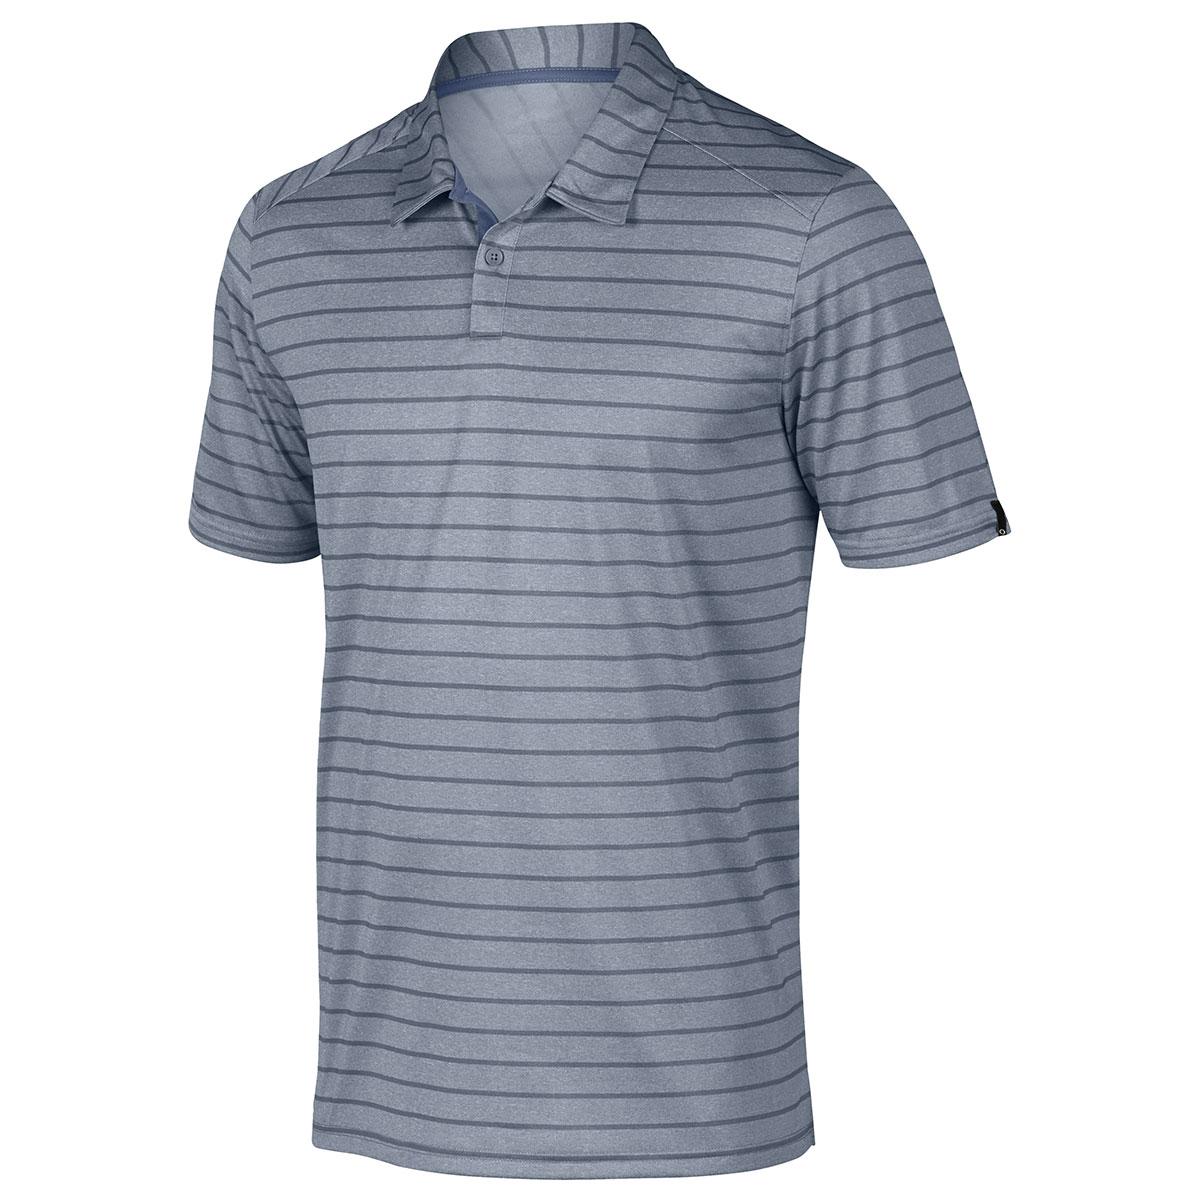 Oakley Golf 2017 Mens Top Stripe Ohydrolix Polo Shirt 433741